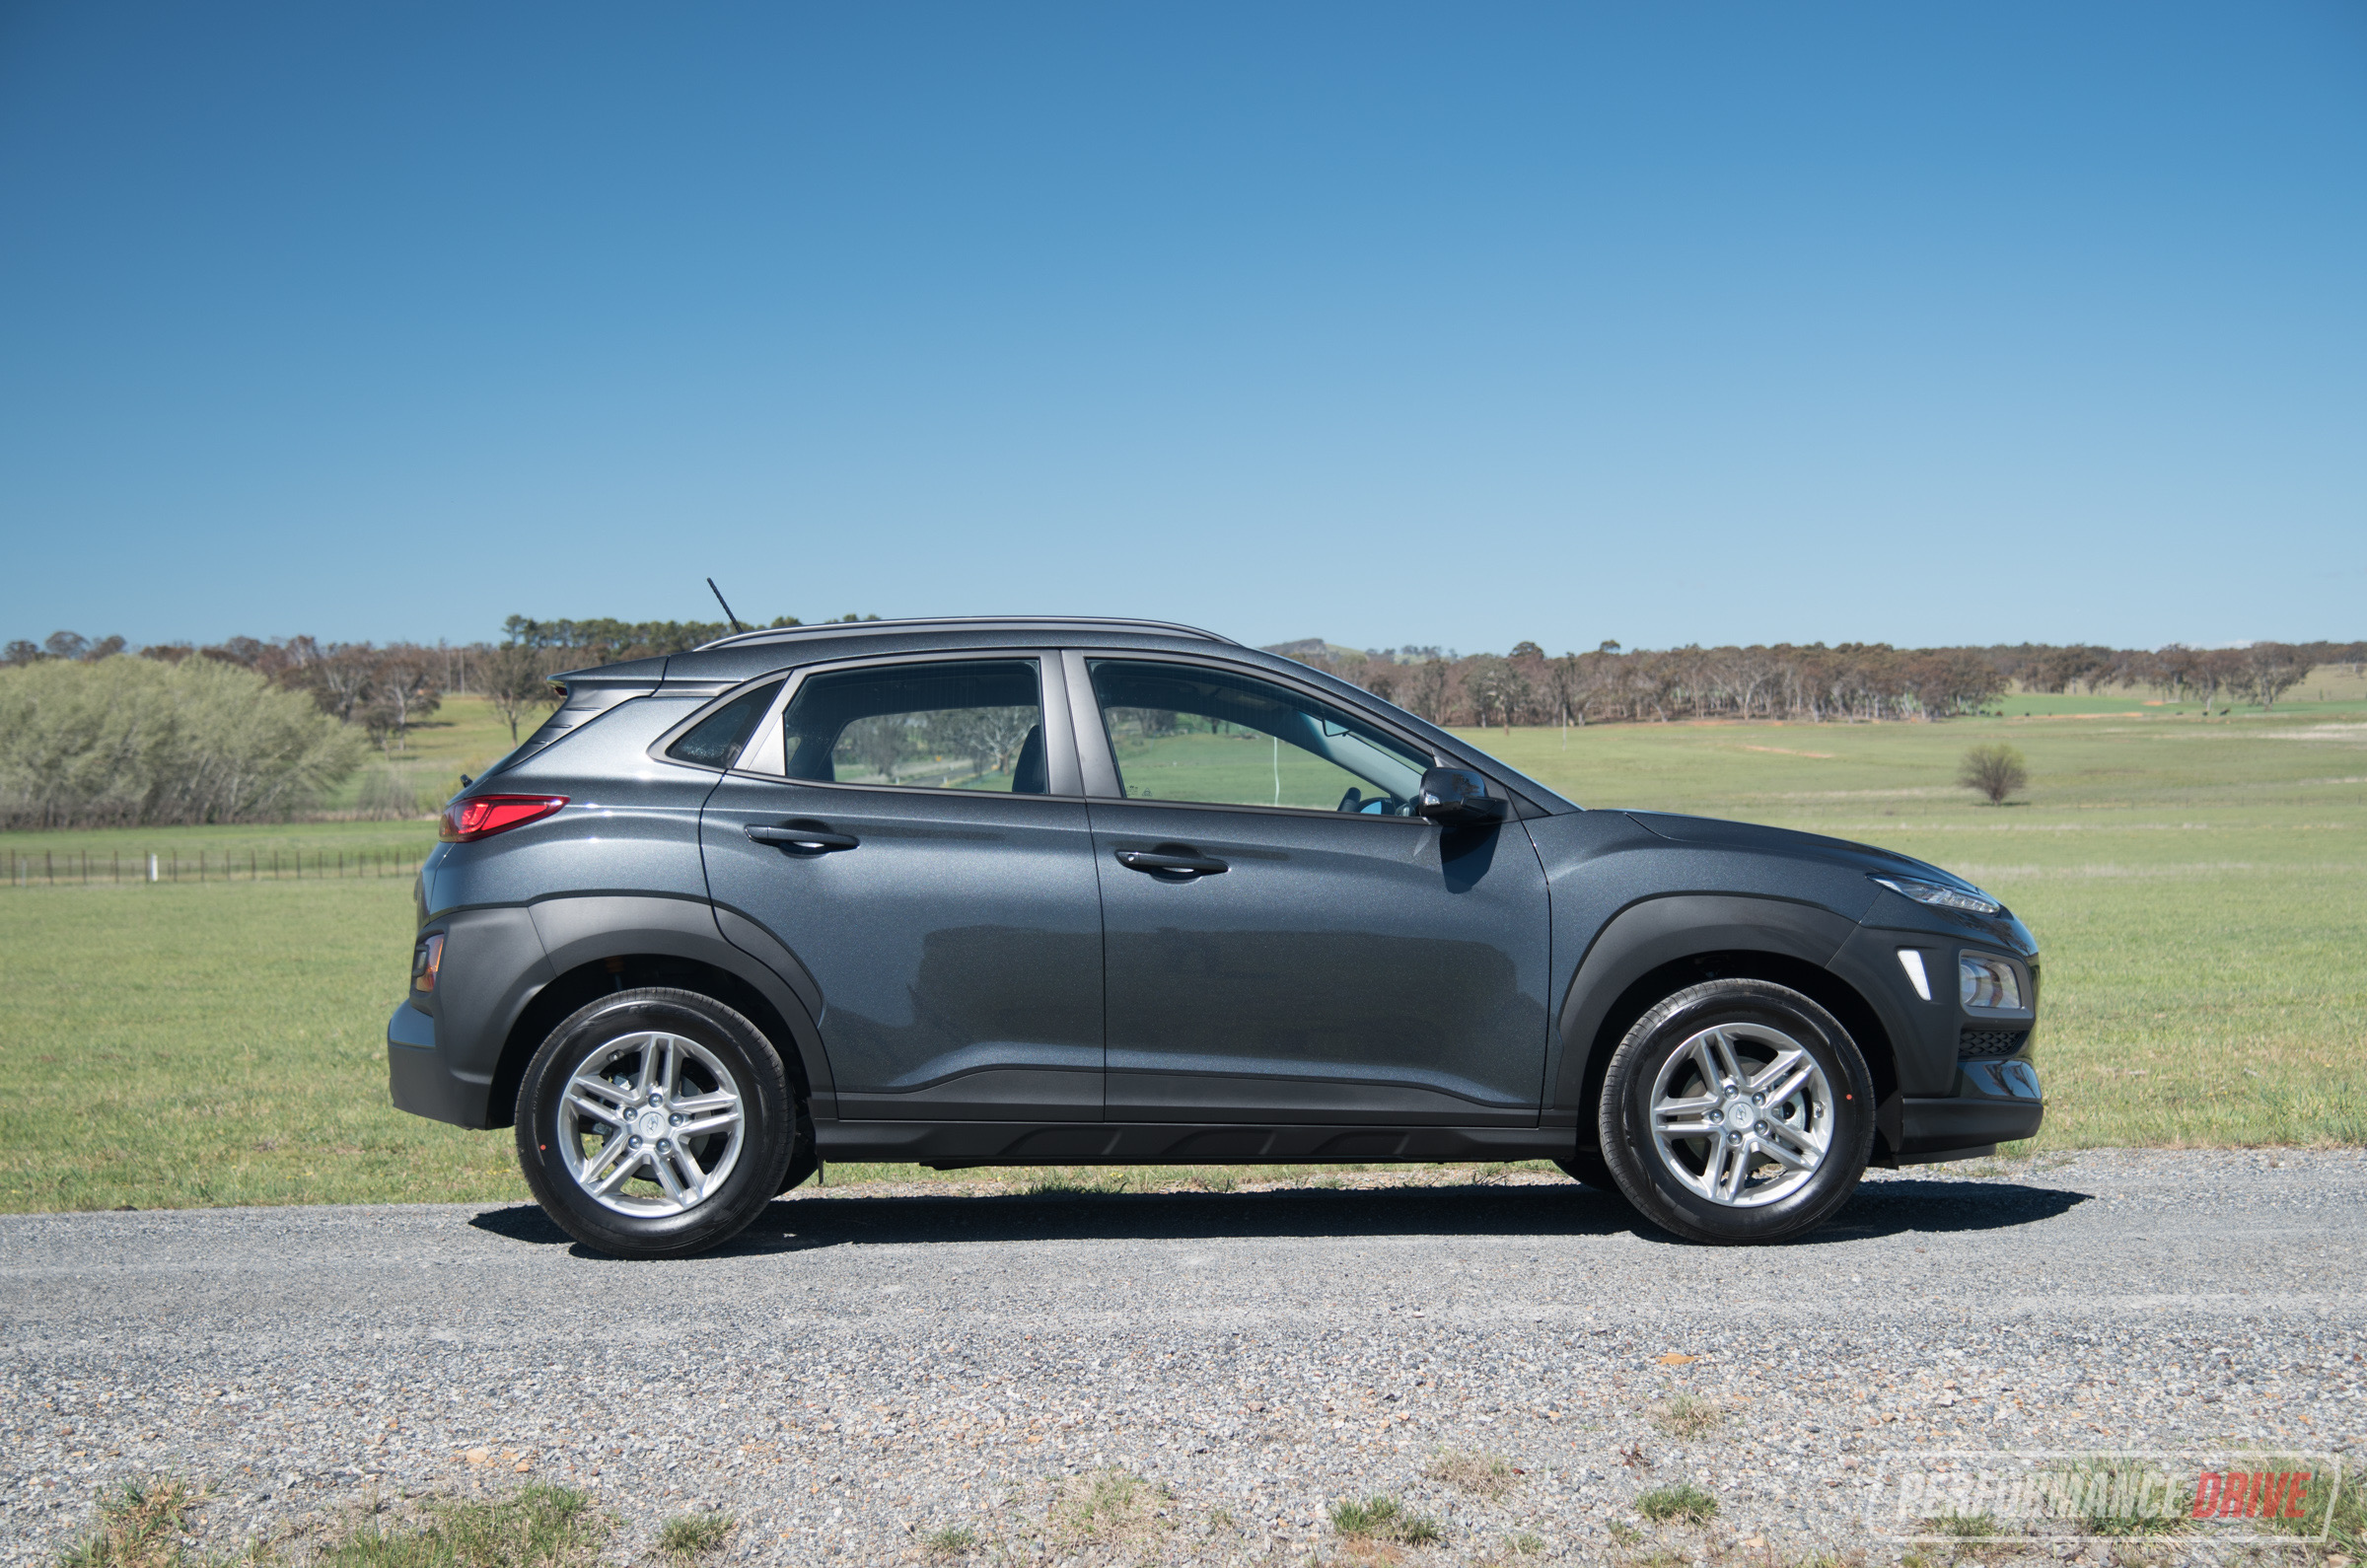 Mazda Cx 5 Elite >> 2017 Hyundai Kona review – Australian launch (video) | PerformanceDrive